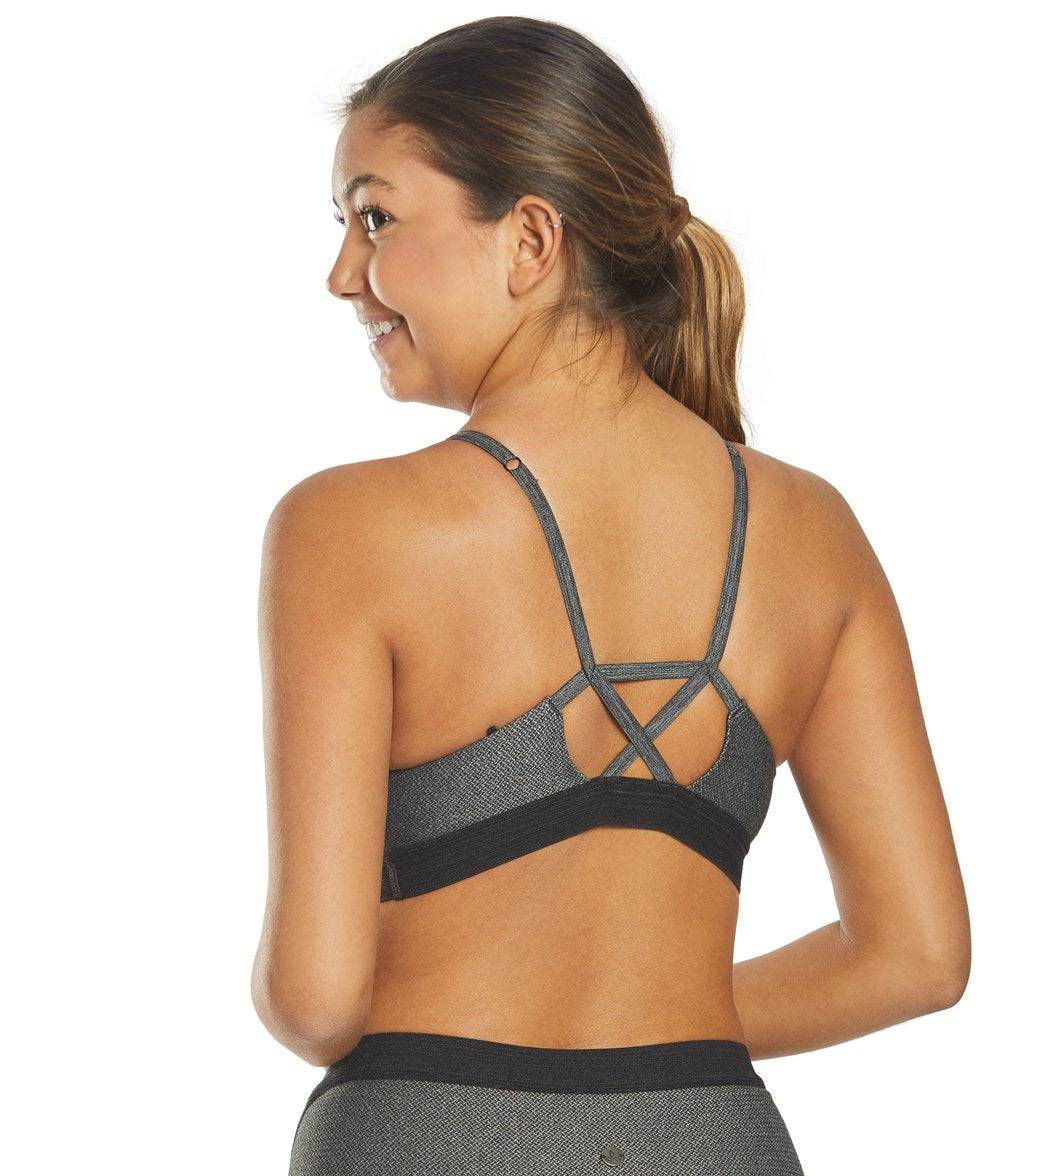 prAna Women's Elisha Yoga Sports Bra - Moon Light Large Cotton Shirt Moisture Wicking